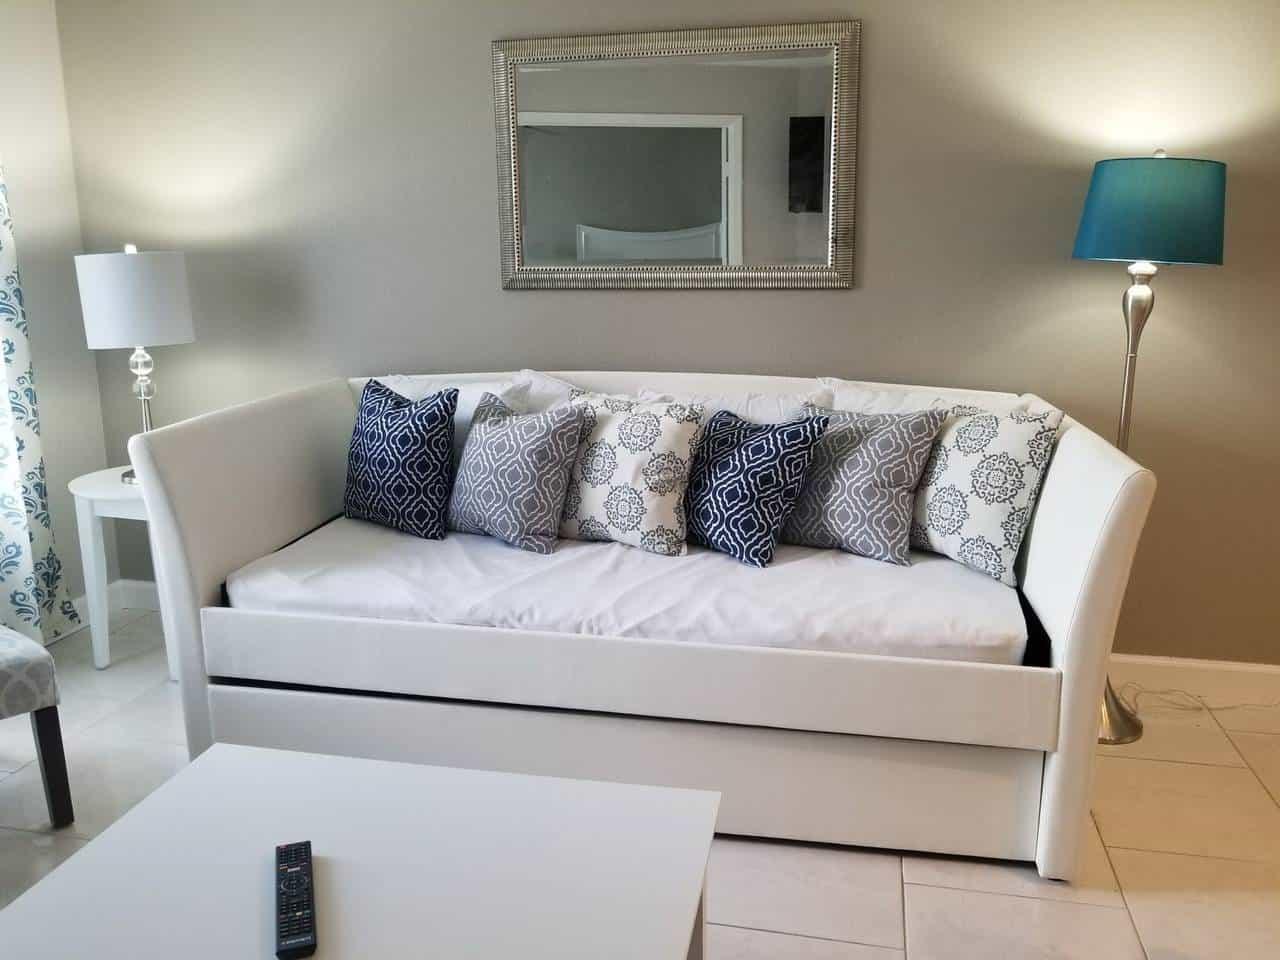 Airbnb Orlando Lake Buena Vista Budget